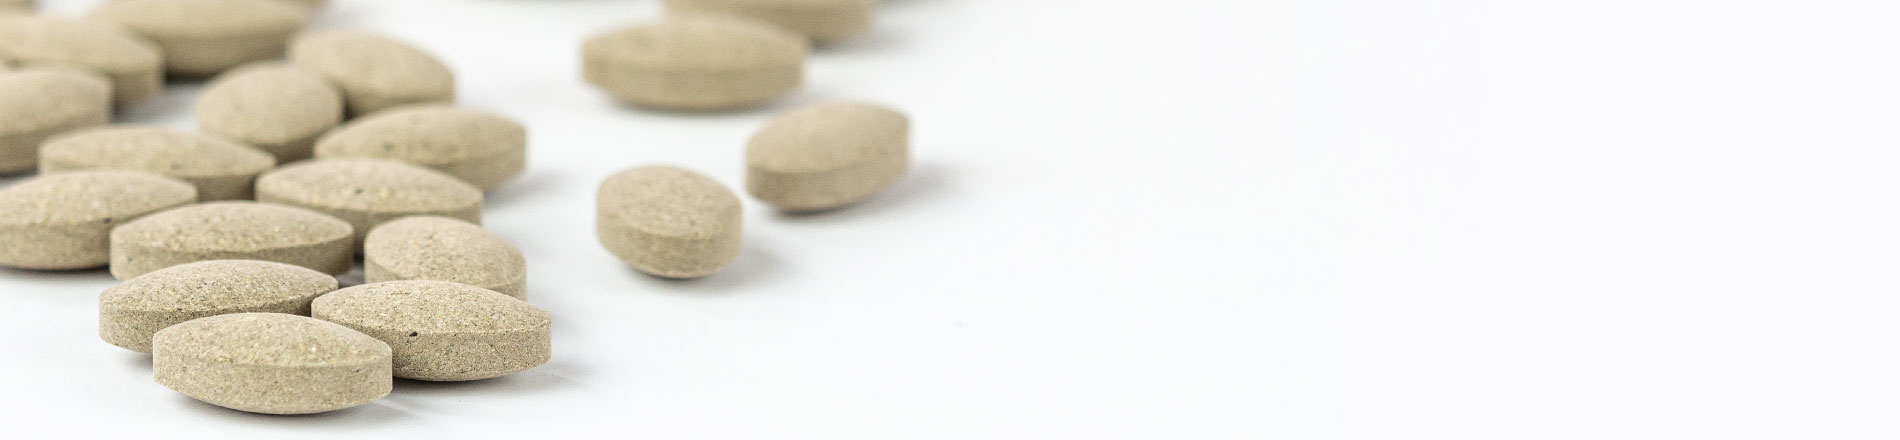 Adrenal Nourish tablets